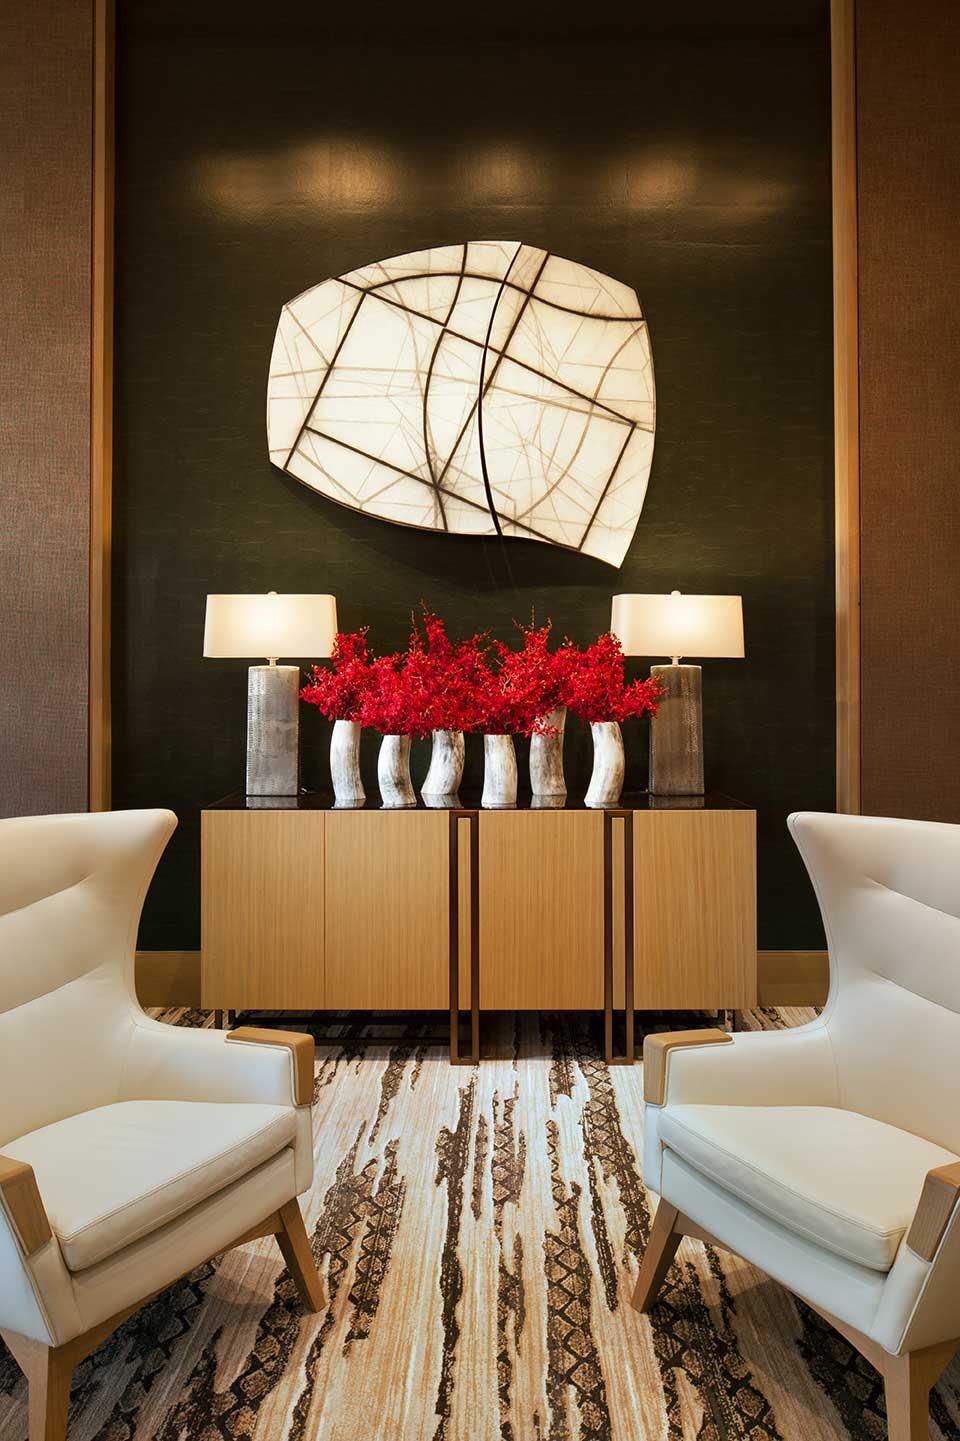 The Phoenician, A Luxury Collection  Scottsdale, AZ